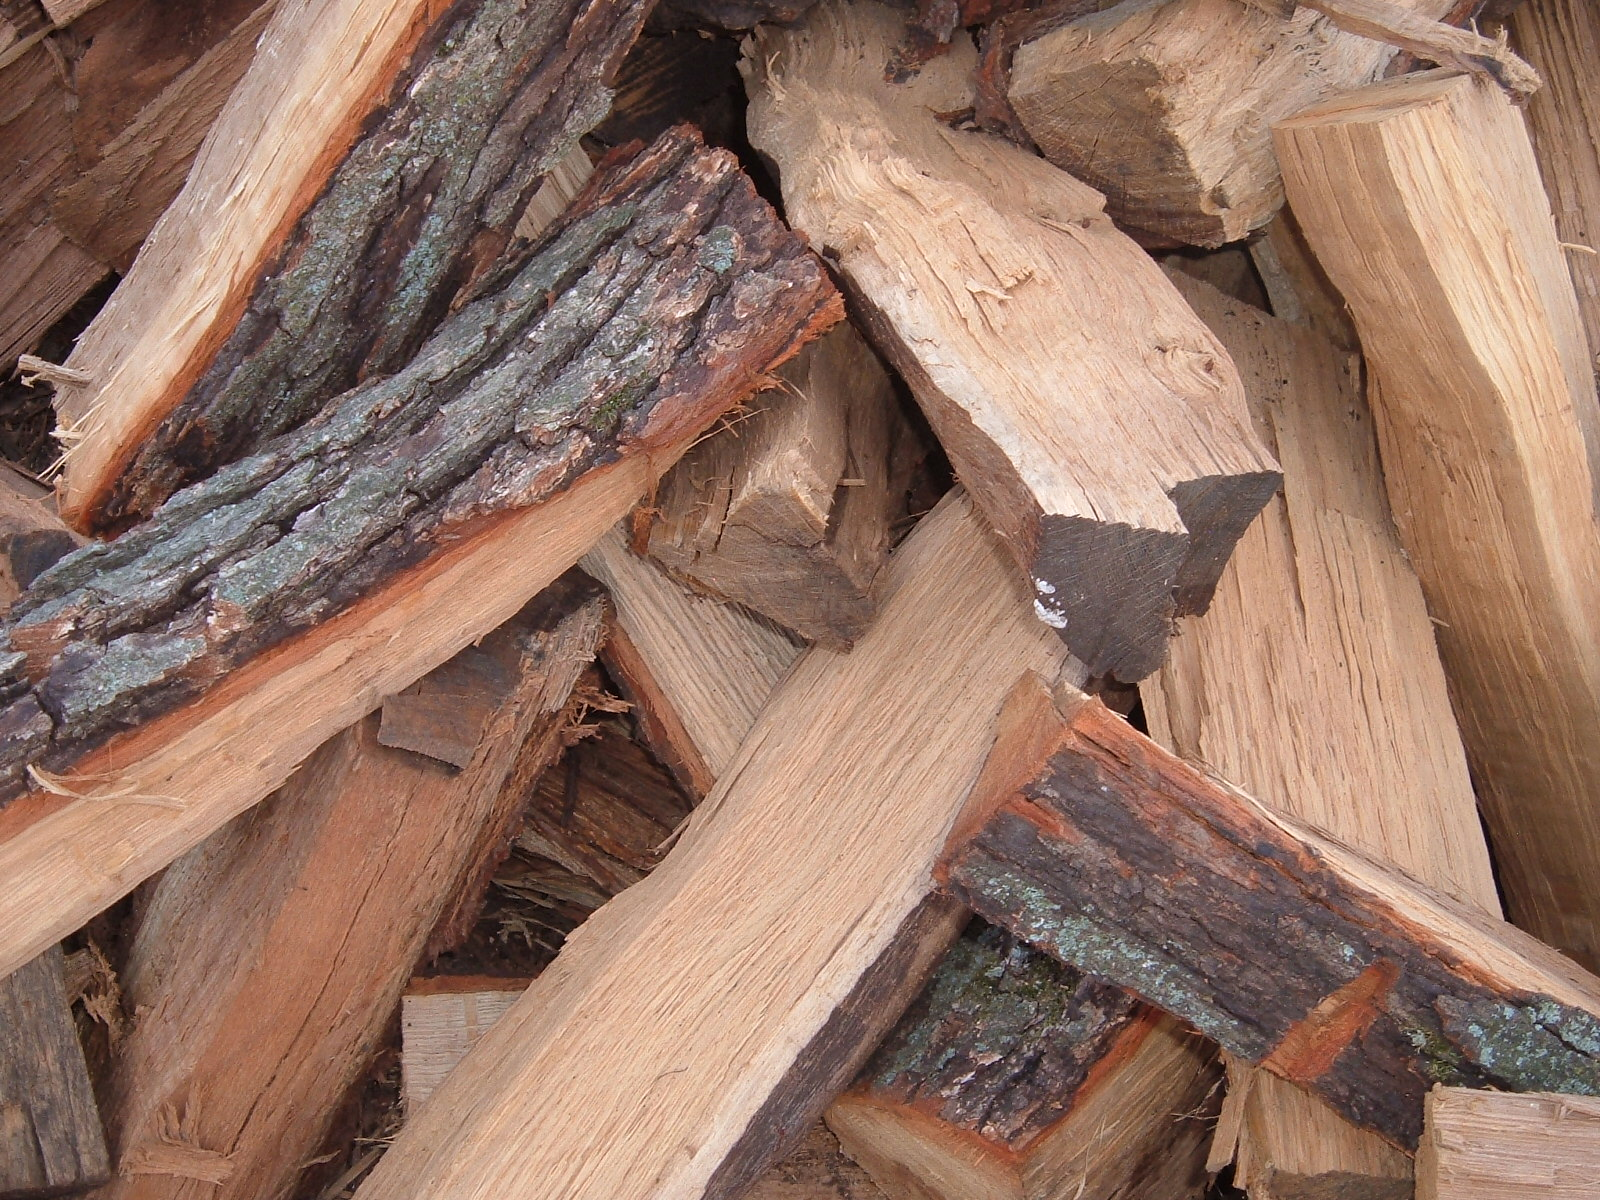 Pine Firewood - Busy Axe